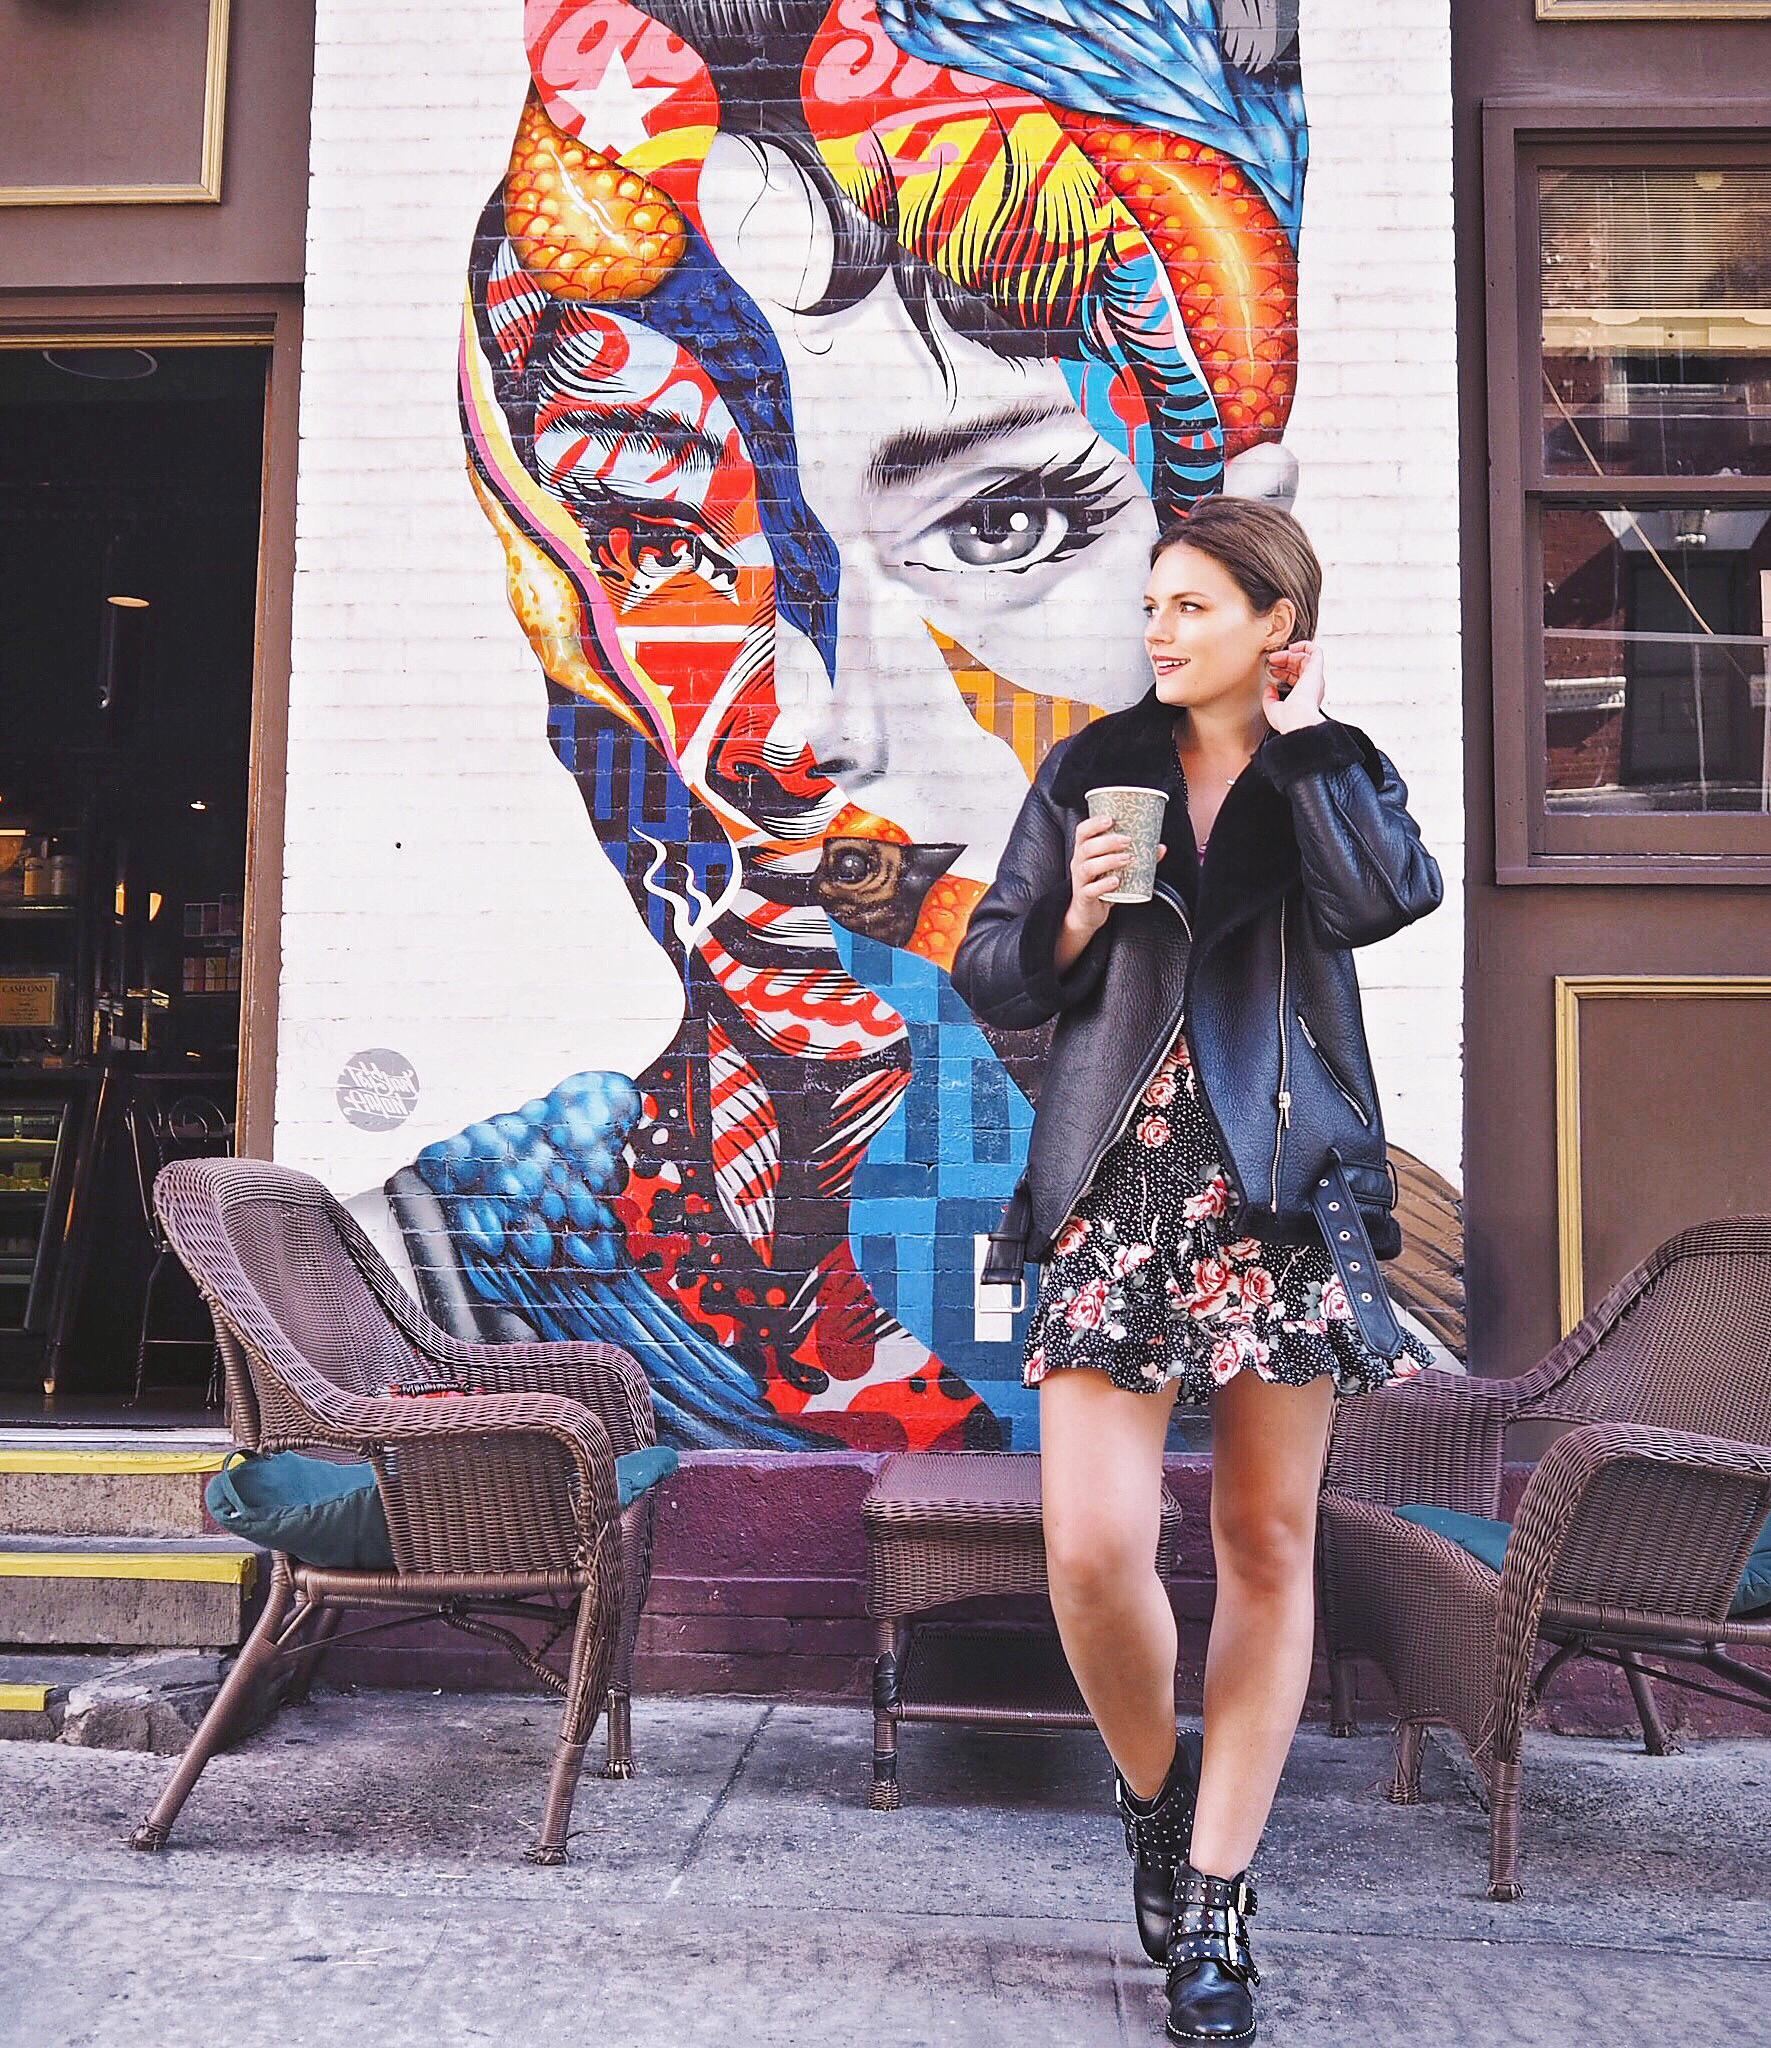 New york cocoa chelsea jesschamilton audrey hepburn graffiti